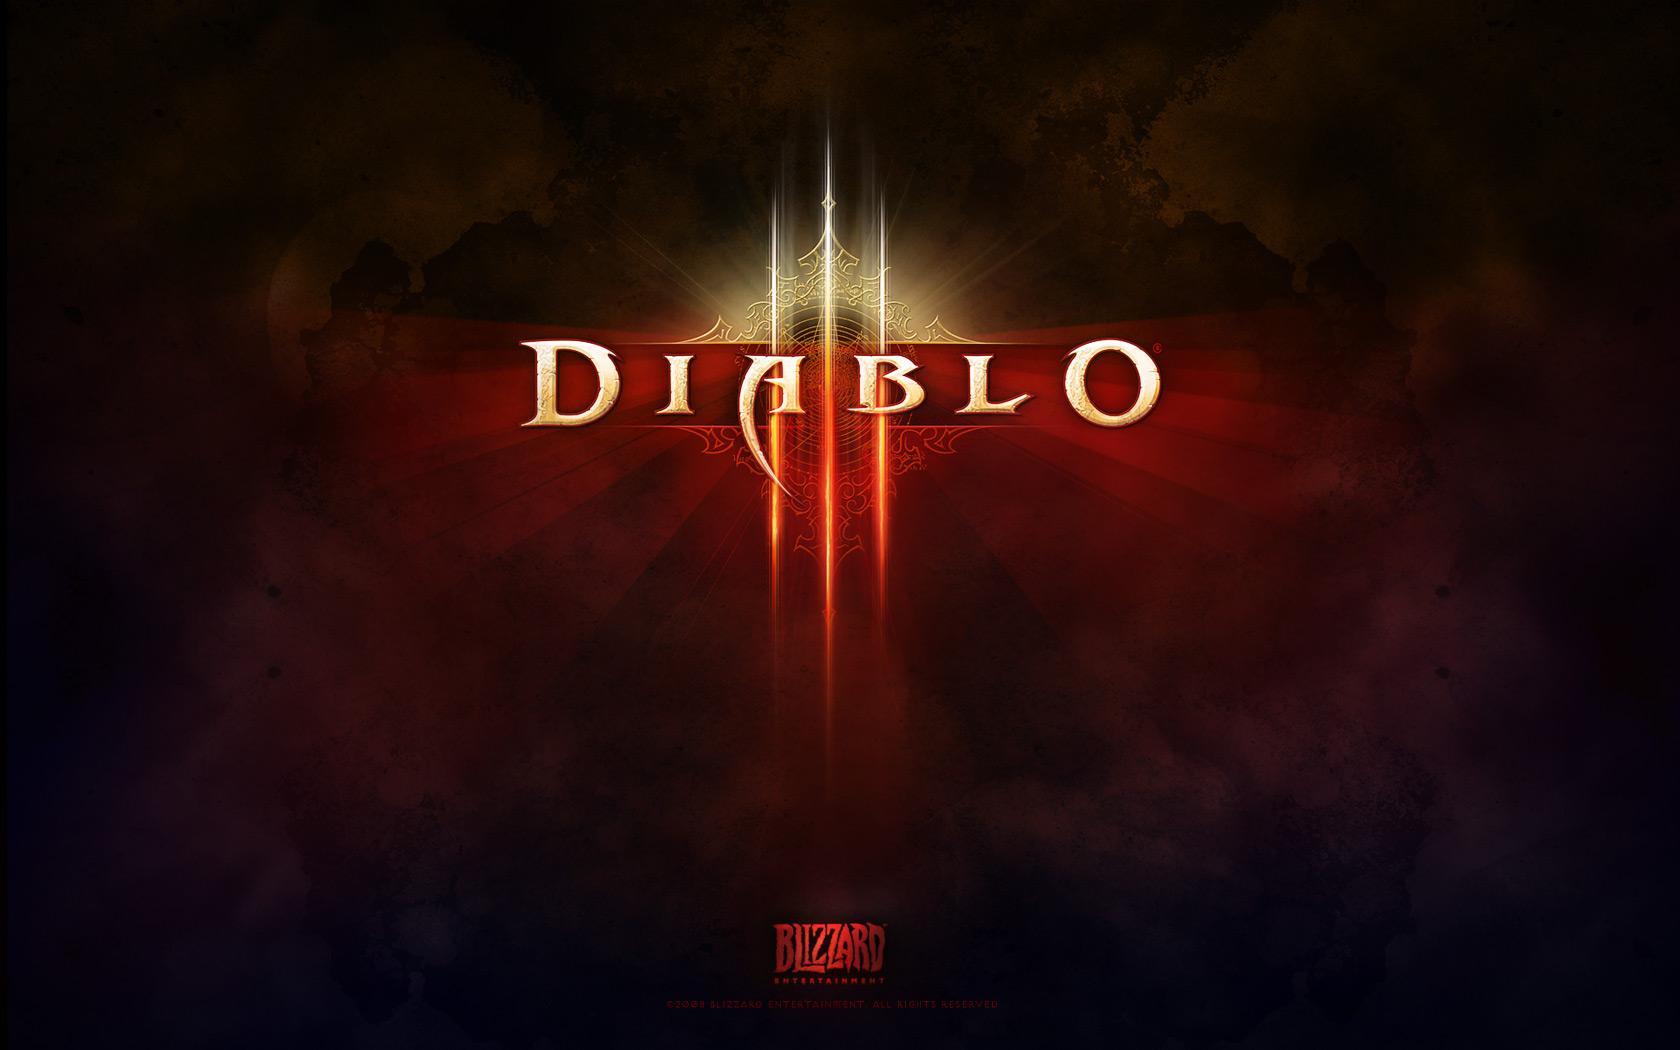 Diablo 3 Screenshot Wallpaper Title Screen